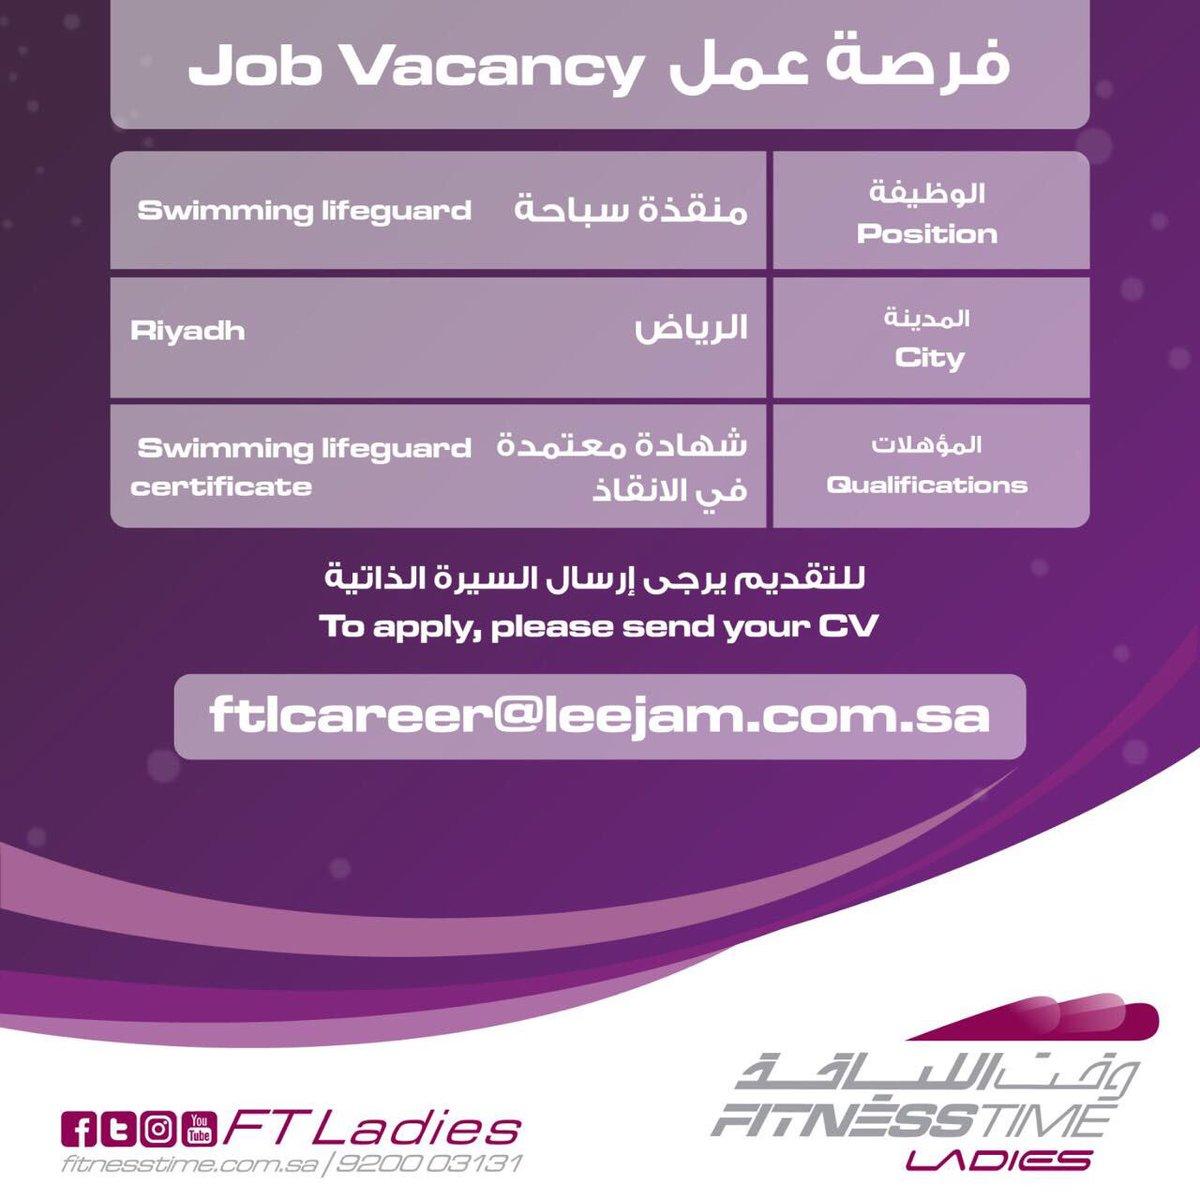 Fitness Time Ladies وقت اللياقة ليديز On Twitter فرصة عمل مطلوب منقذة سباحة للعمل في الرياض Job Vacancy For Lifeguard In Riyadh Ftlcareer Leejam Com Sa